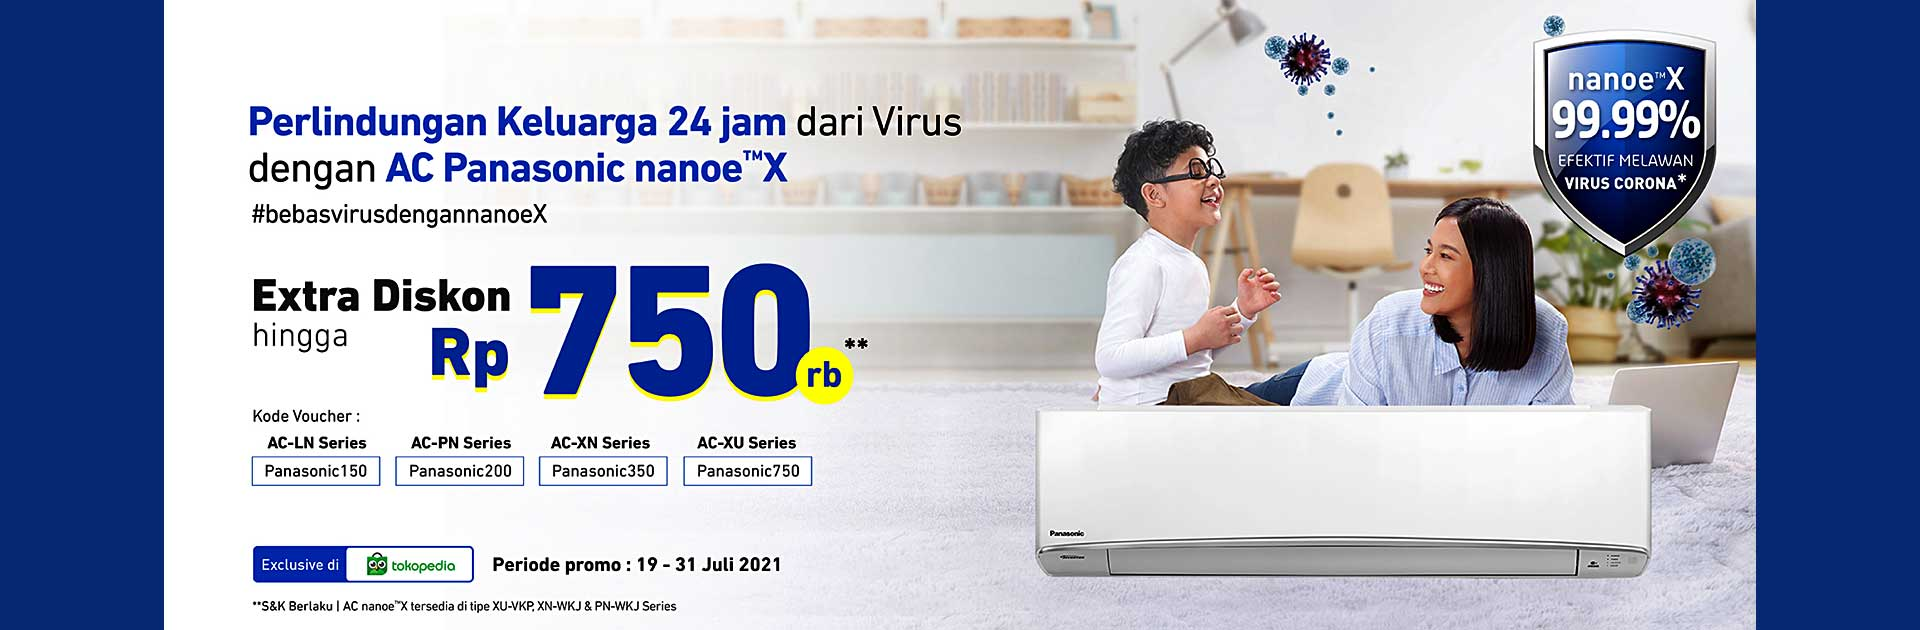 Promo AC Panasonic Extra Discount AC Nanoe-X